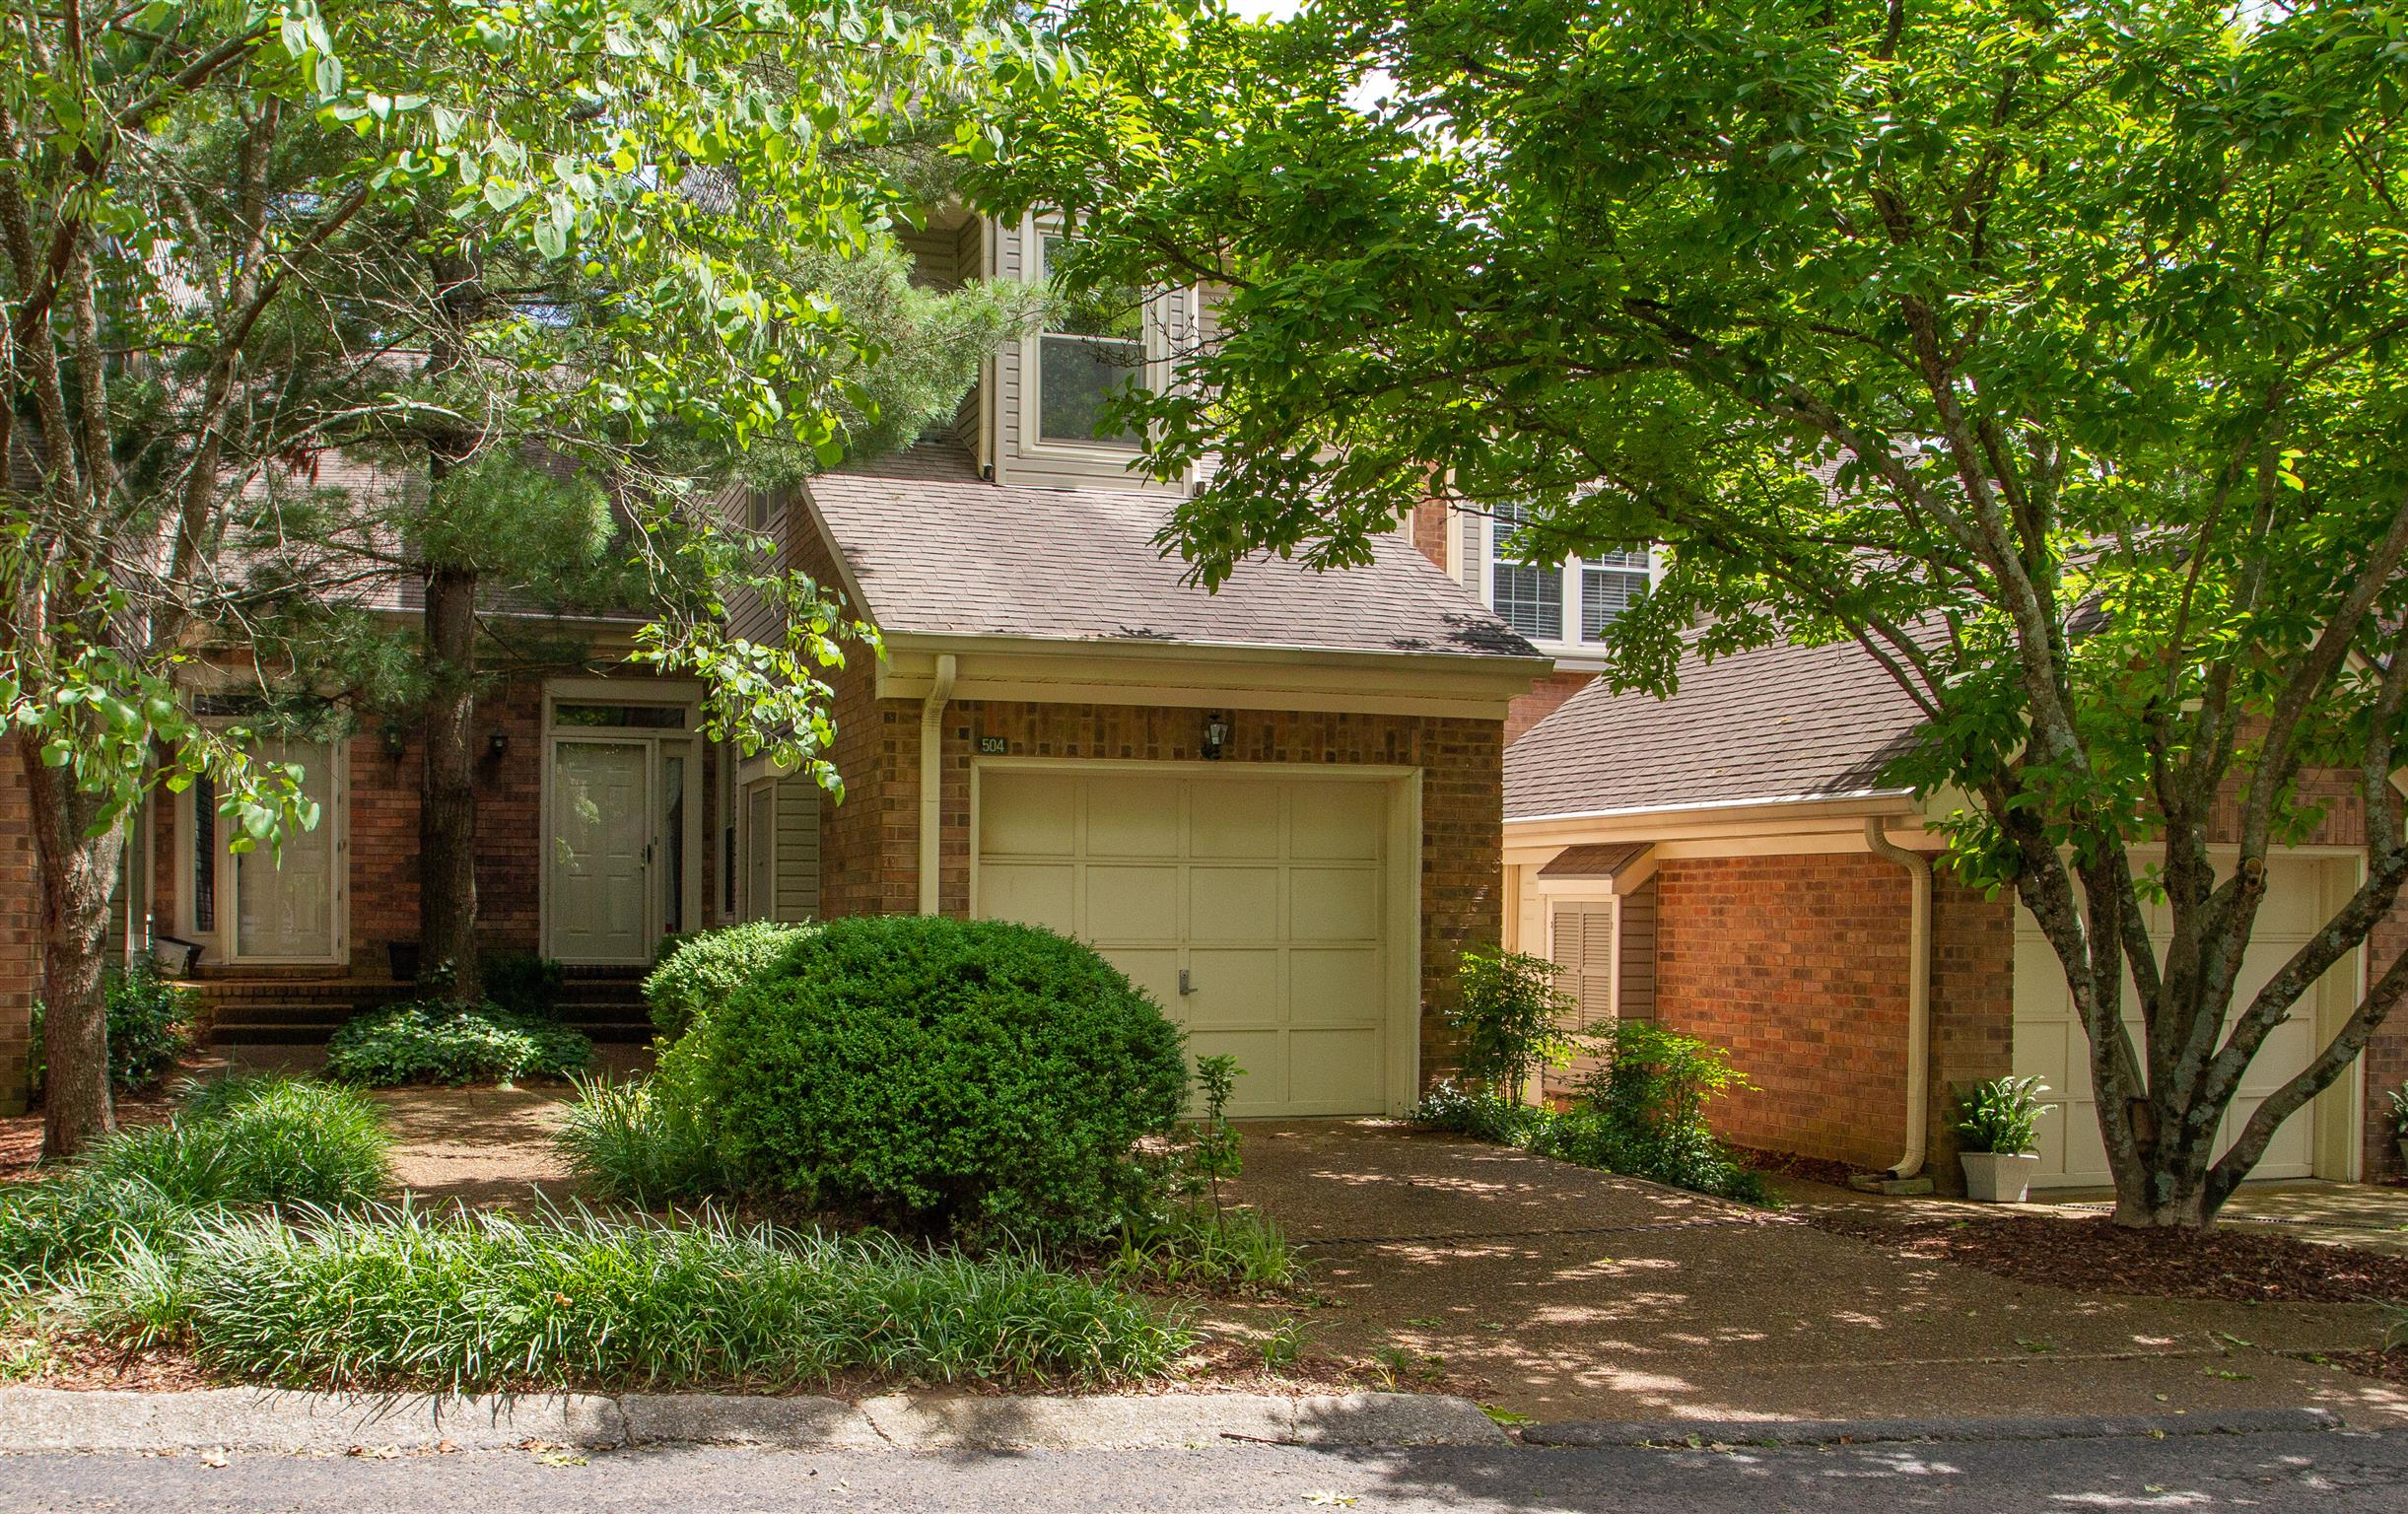 504 Belair Way, Nashville, TN 37215 - Nashville, TN real estate listing